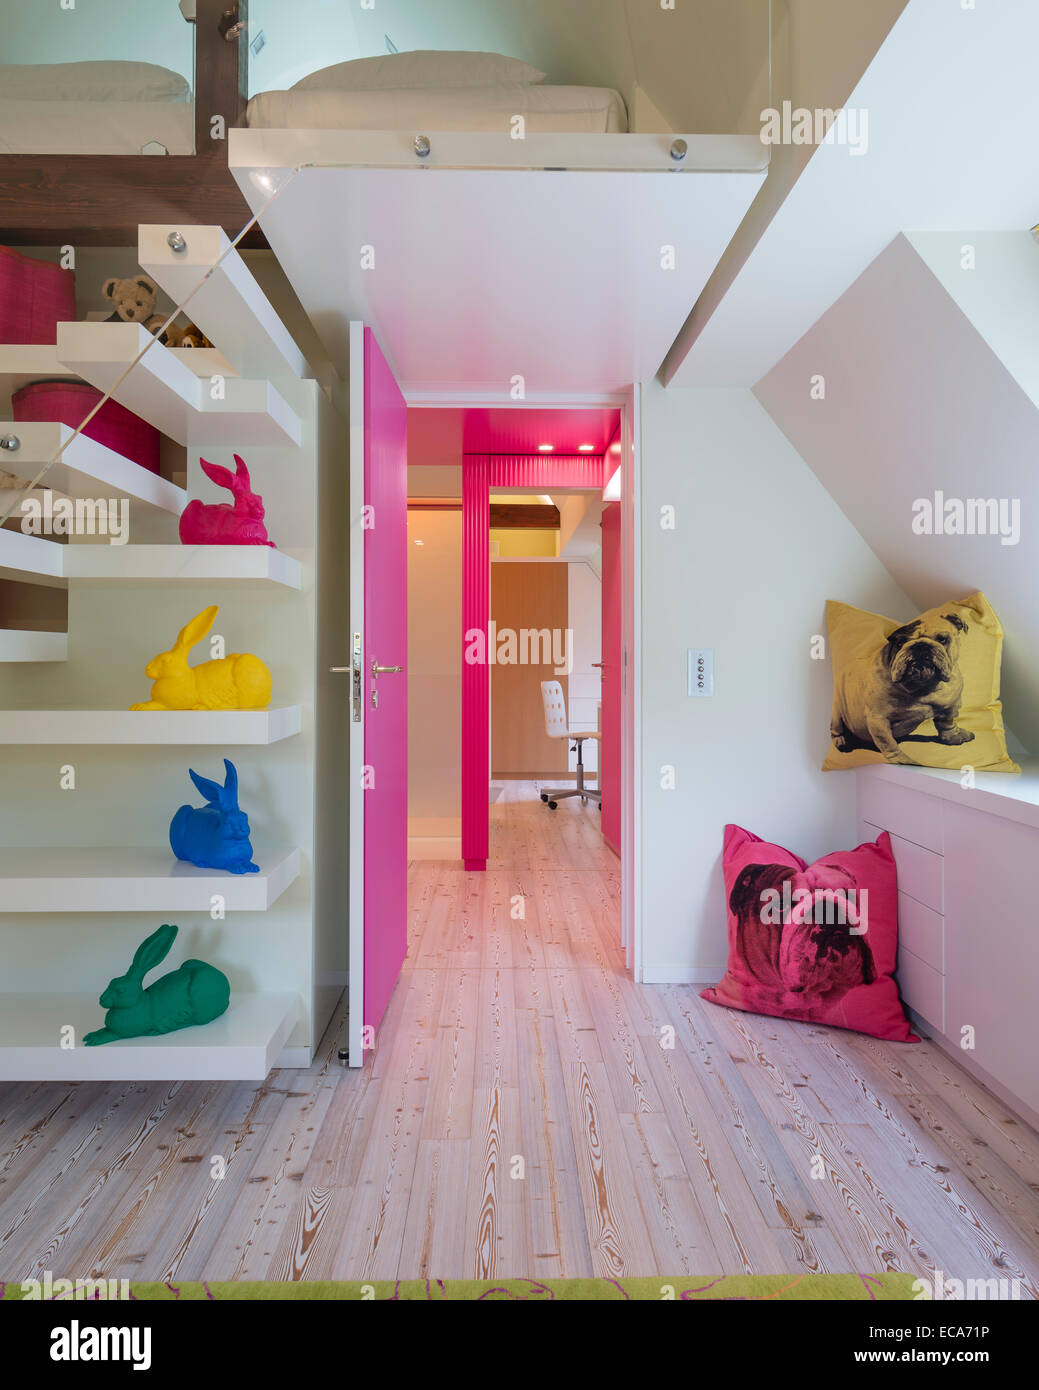 Bulldog print Kissen und Mauerstruktur farbig Dürer Hasen Künstlers Ottmar Hörl im Kinderschlafzimmer Stockbild